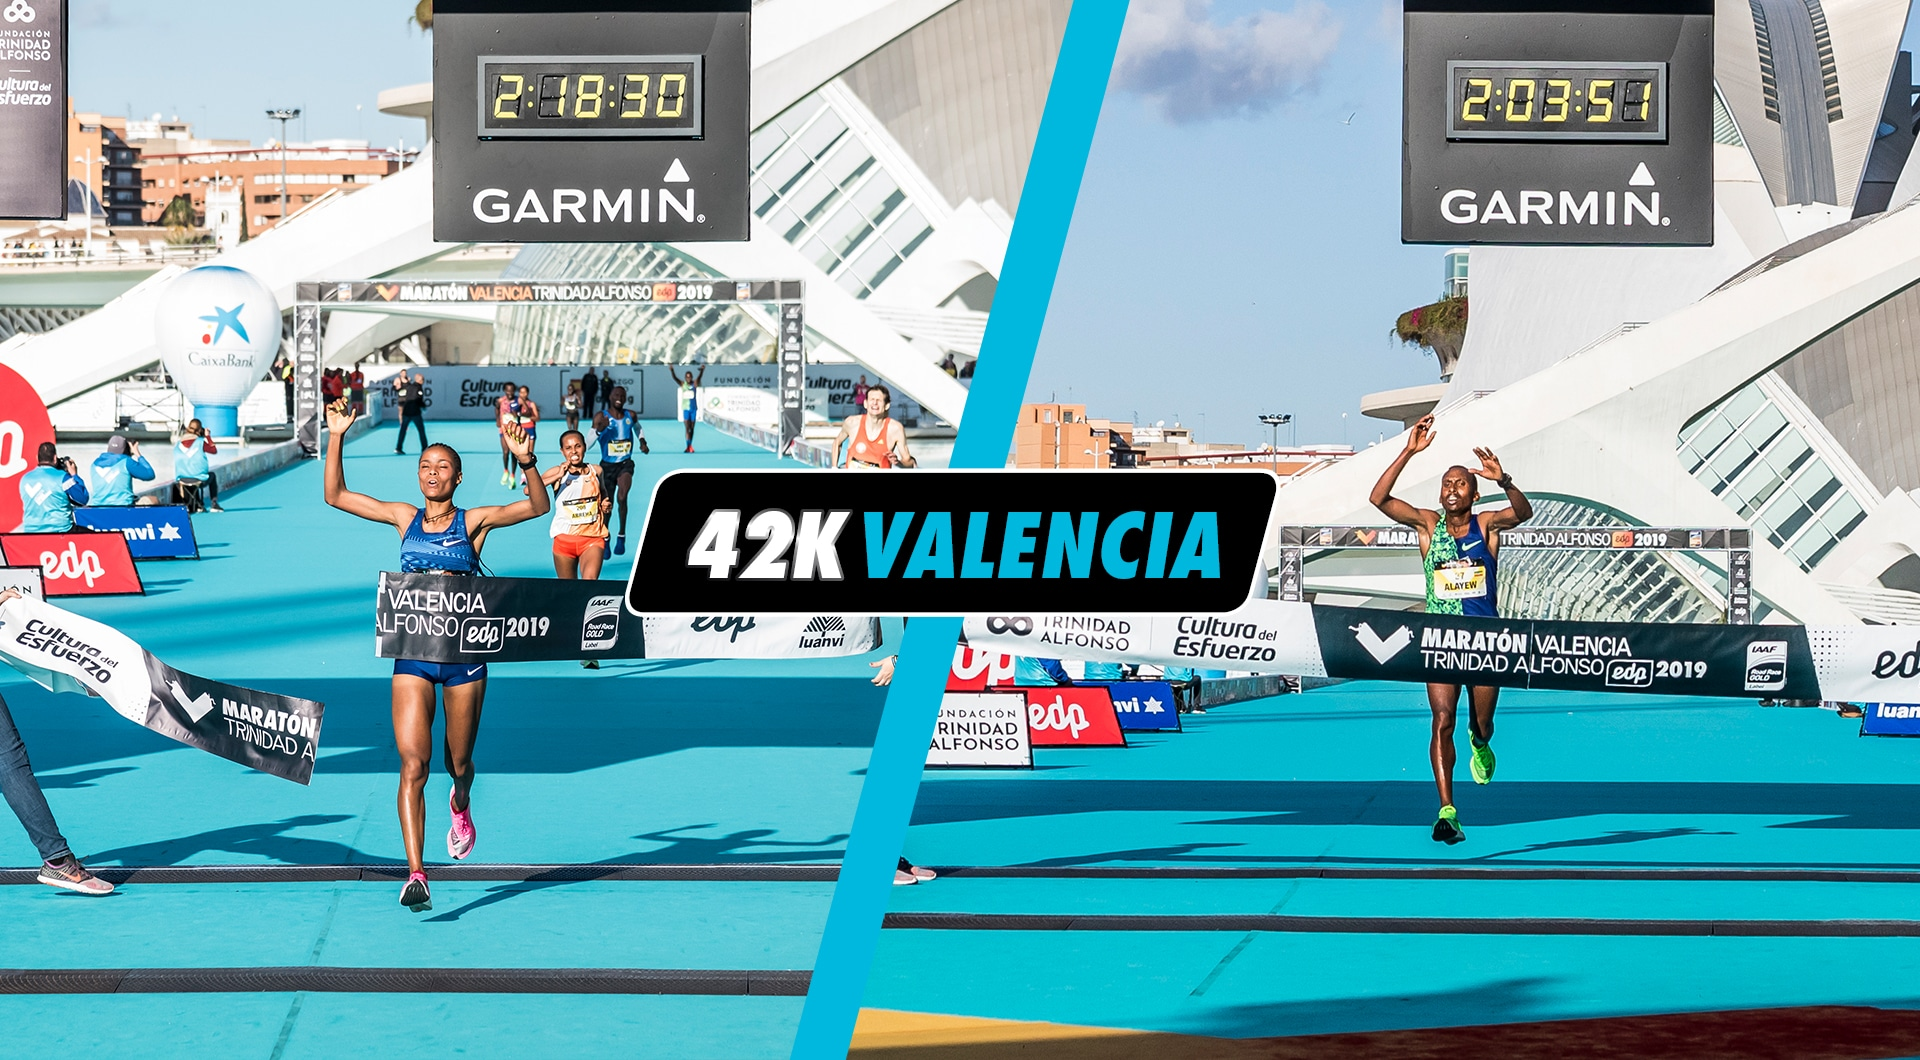 Ganadores Maraton Valencia Trinidad Alfonso EDP